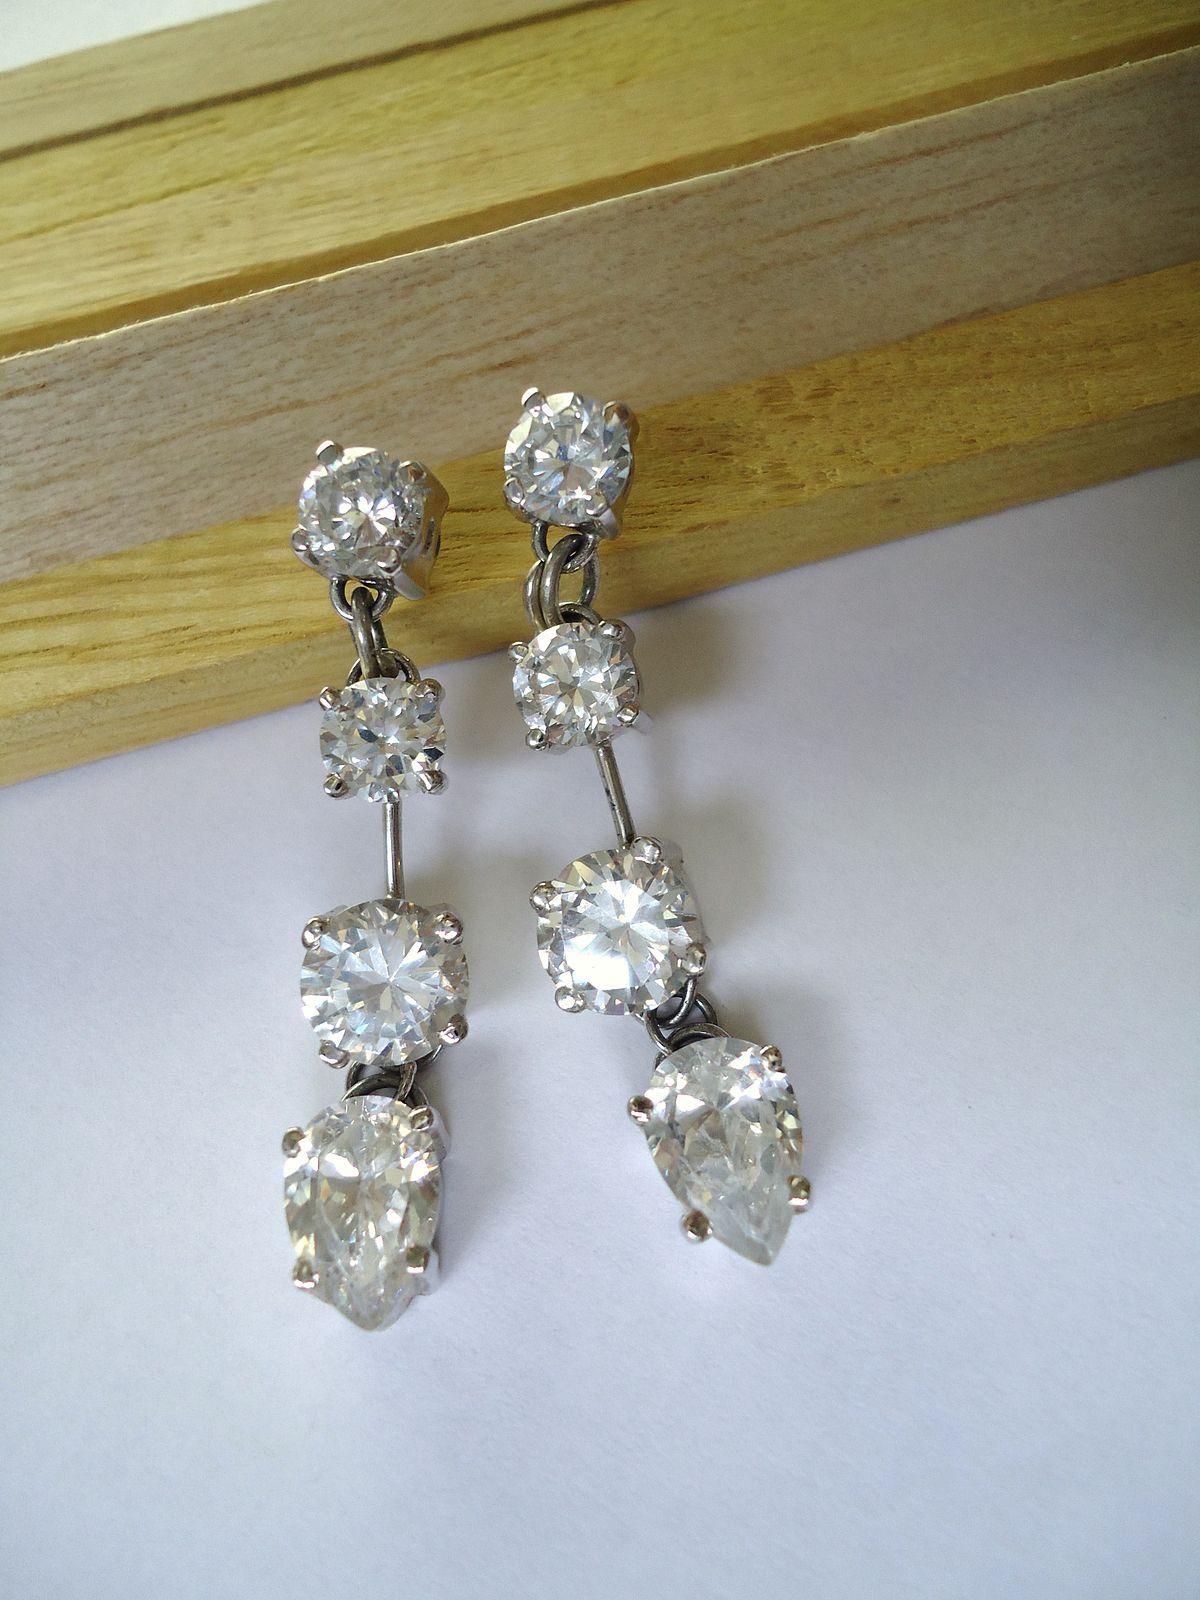 File:White gold and diamonds earrings.JPG - Wikimedia Commons